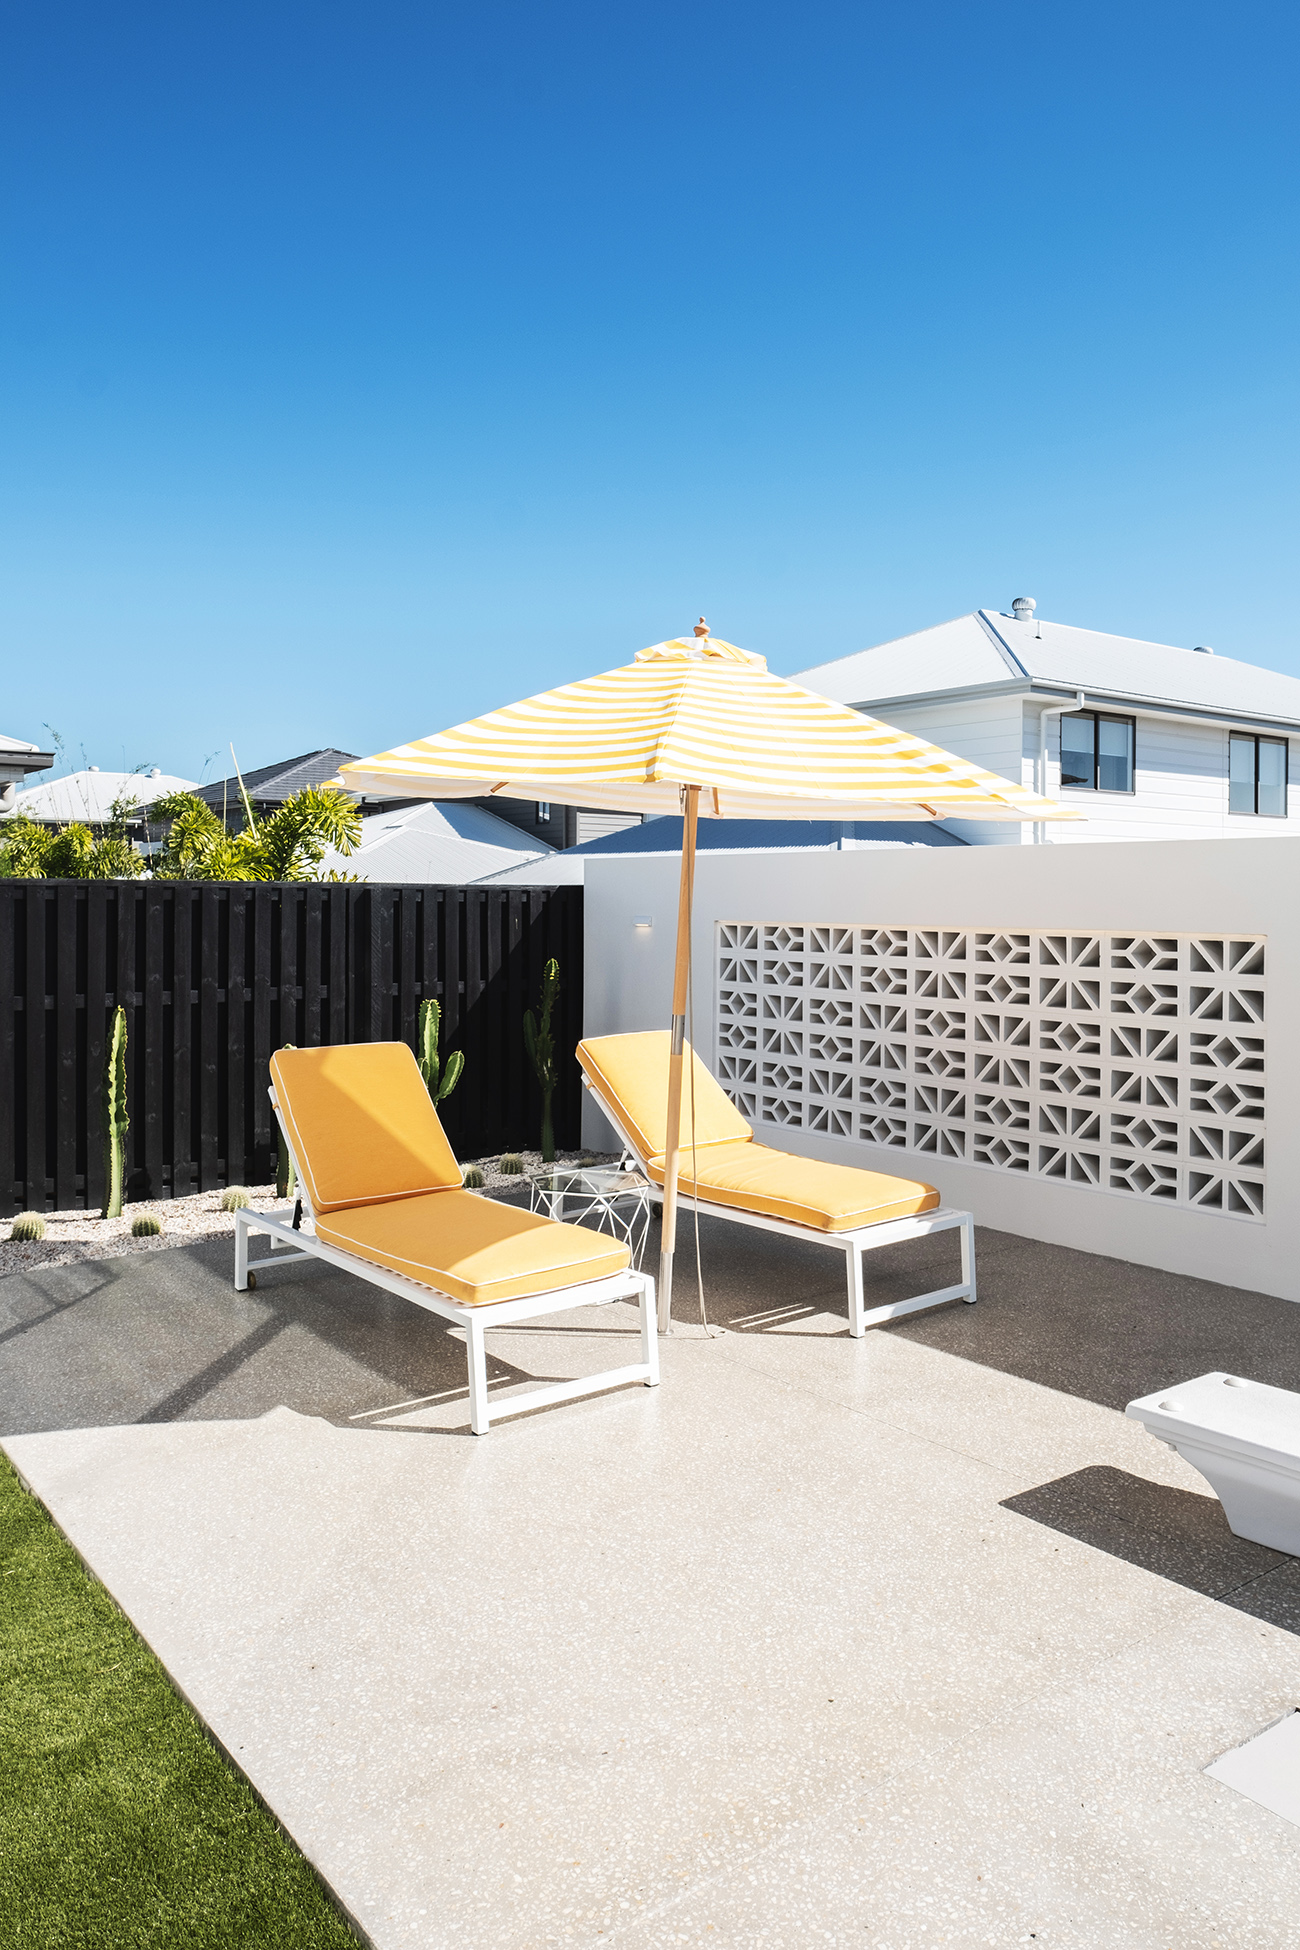 aston_milan_palm_springs_style_outdoor_pool_yellow_umbrella.jpg